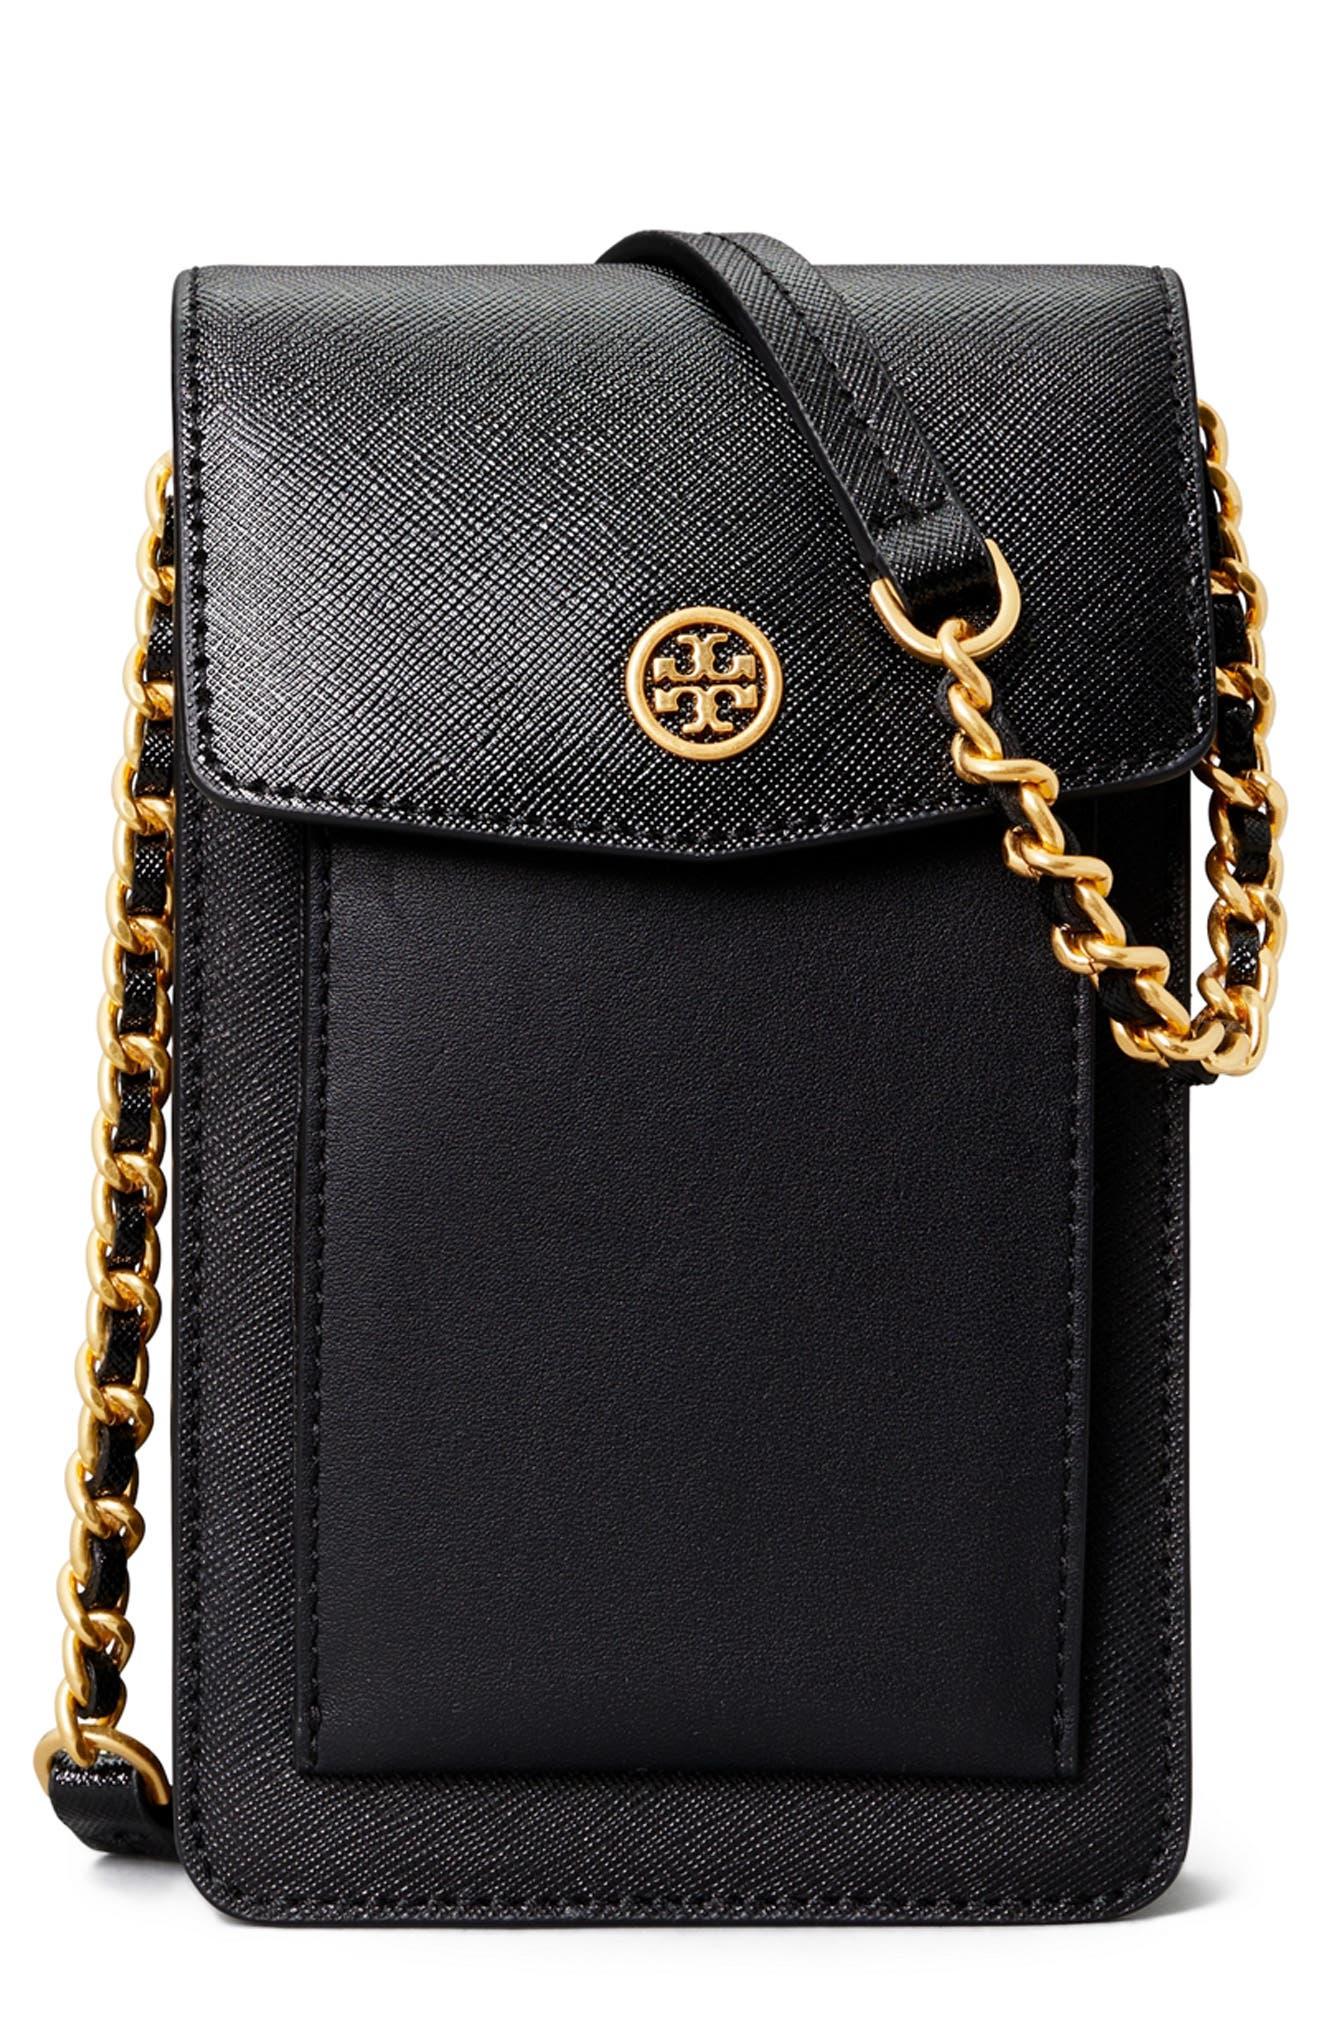 Tory Burch Women's Tory Burch Robinson Mixed Leather Phone Crossbody Bag - Black